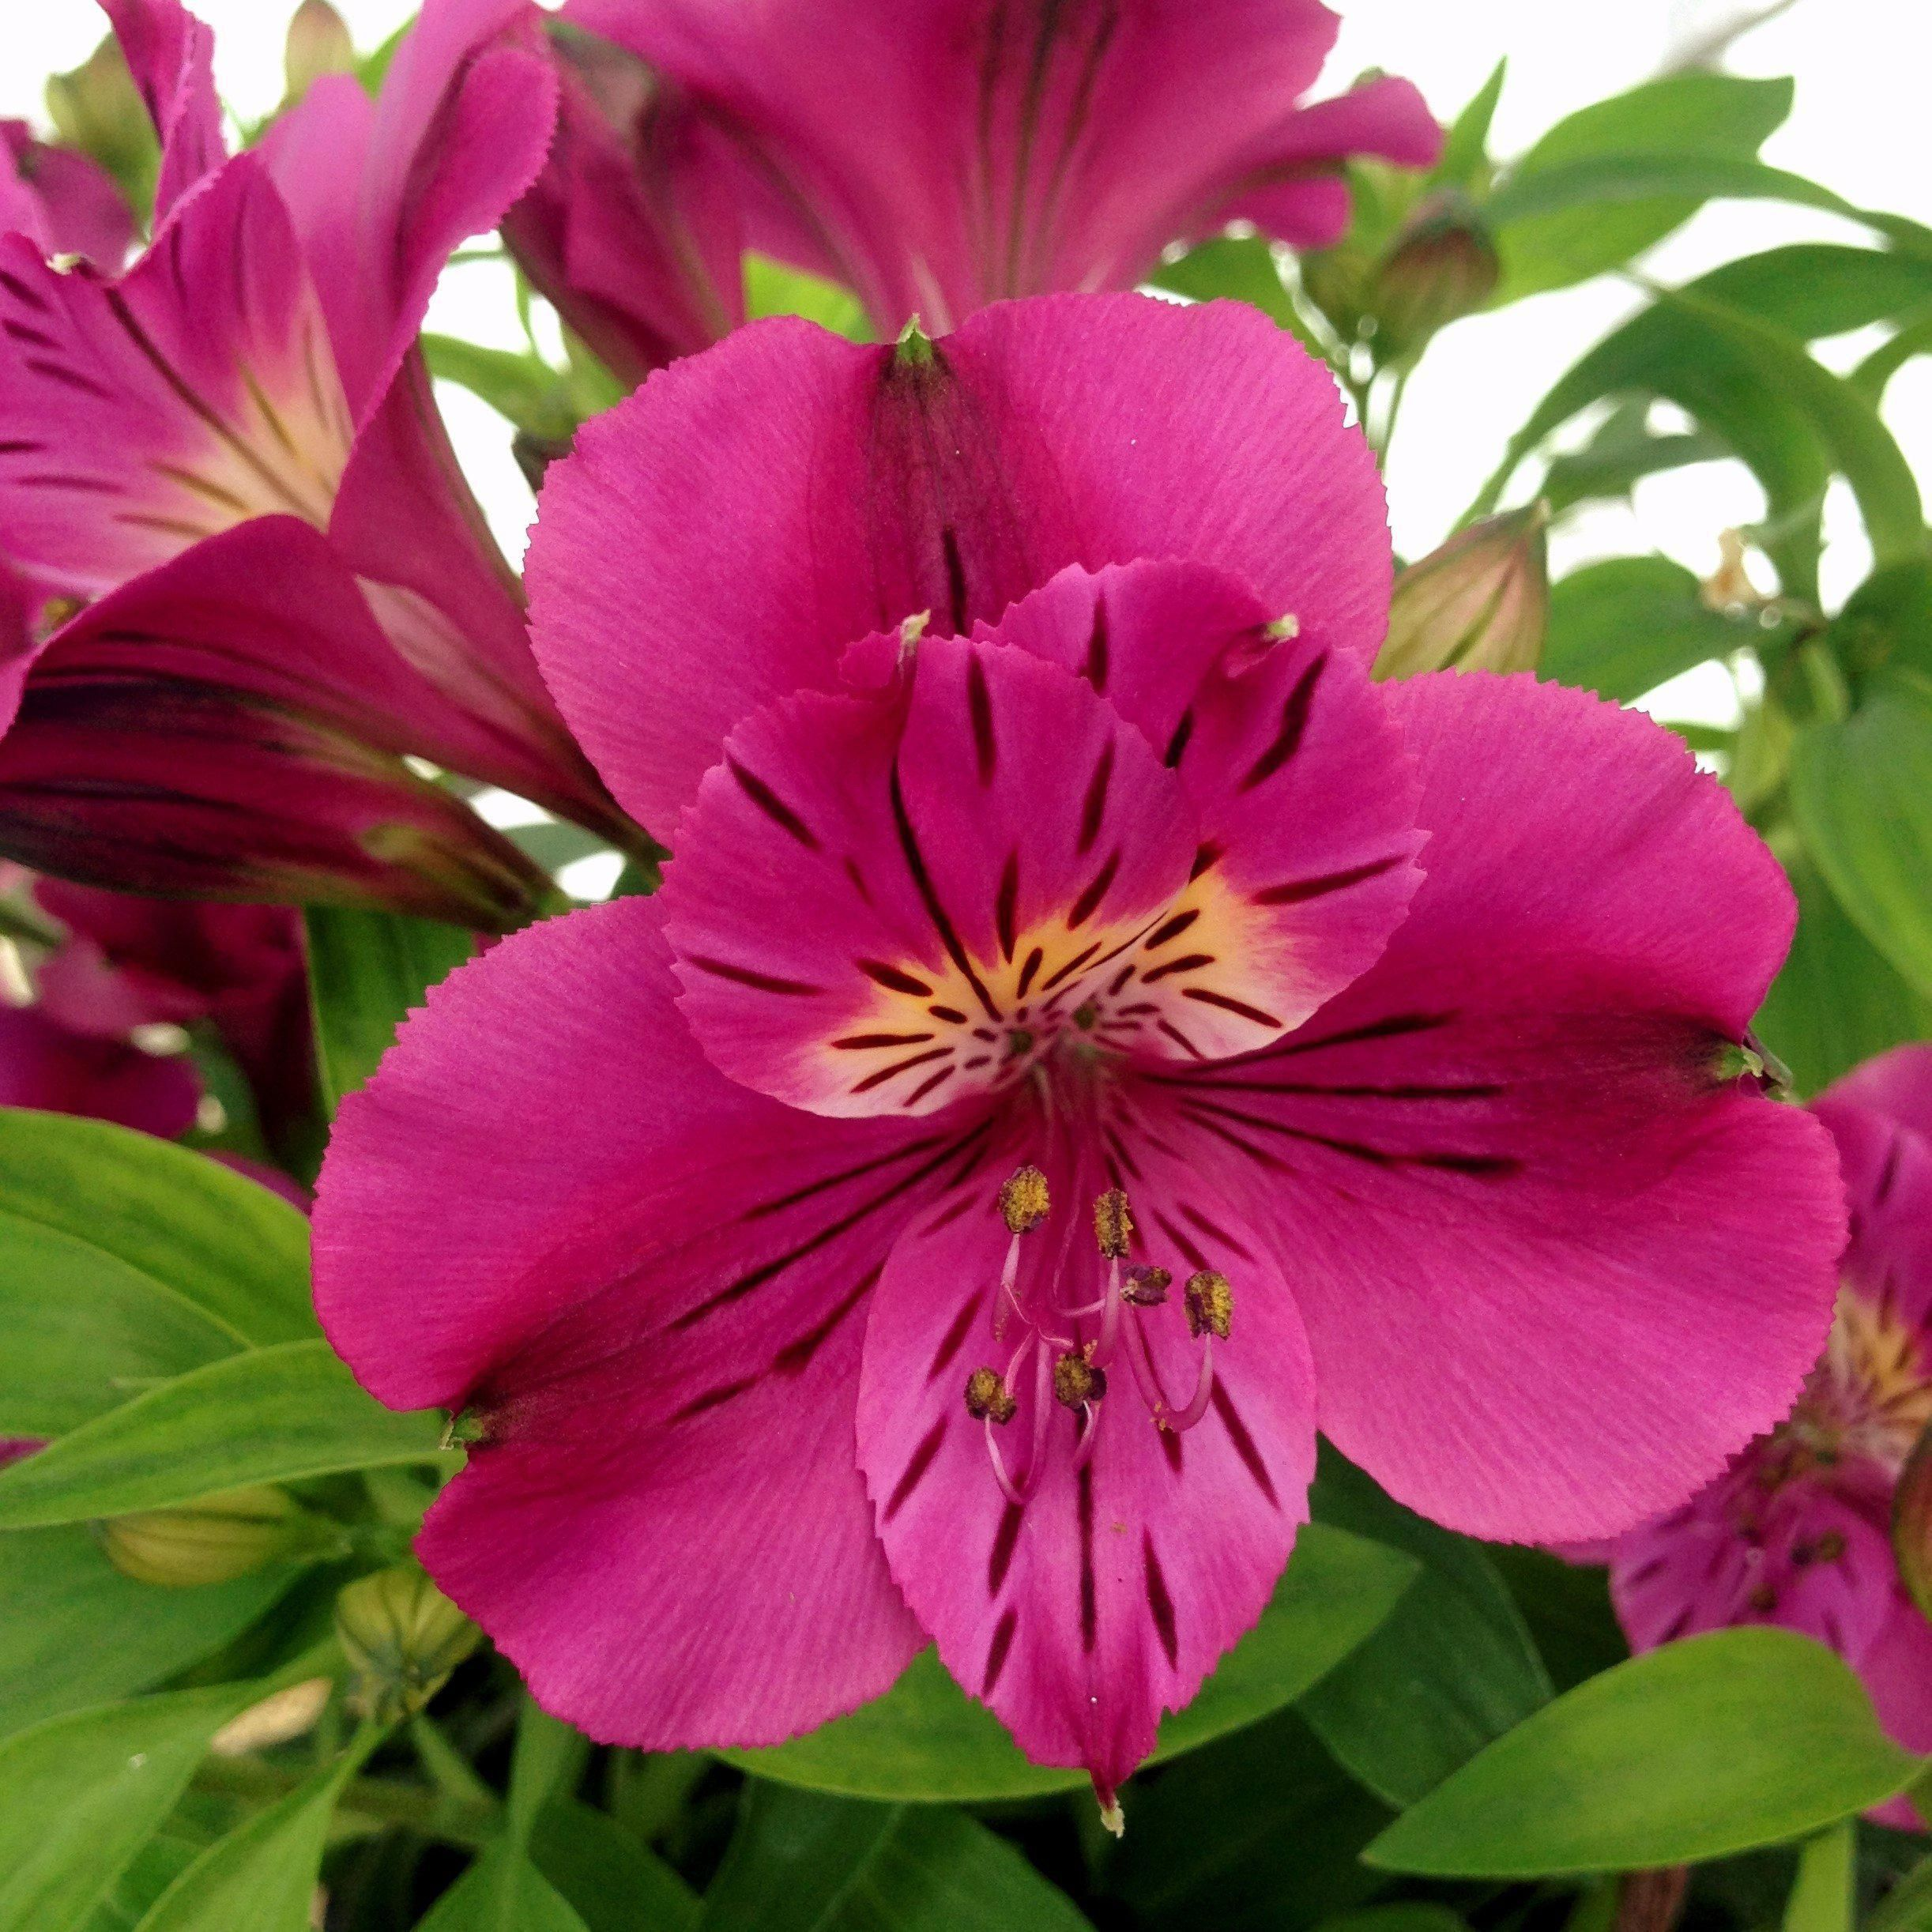 Allium Ampeloprasum Alstroemeria Lily Plants Easy To Grow Bulbs